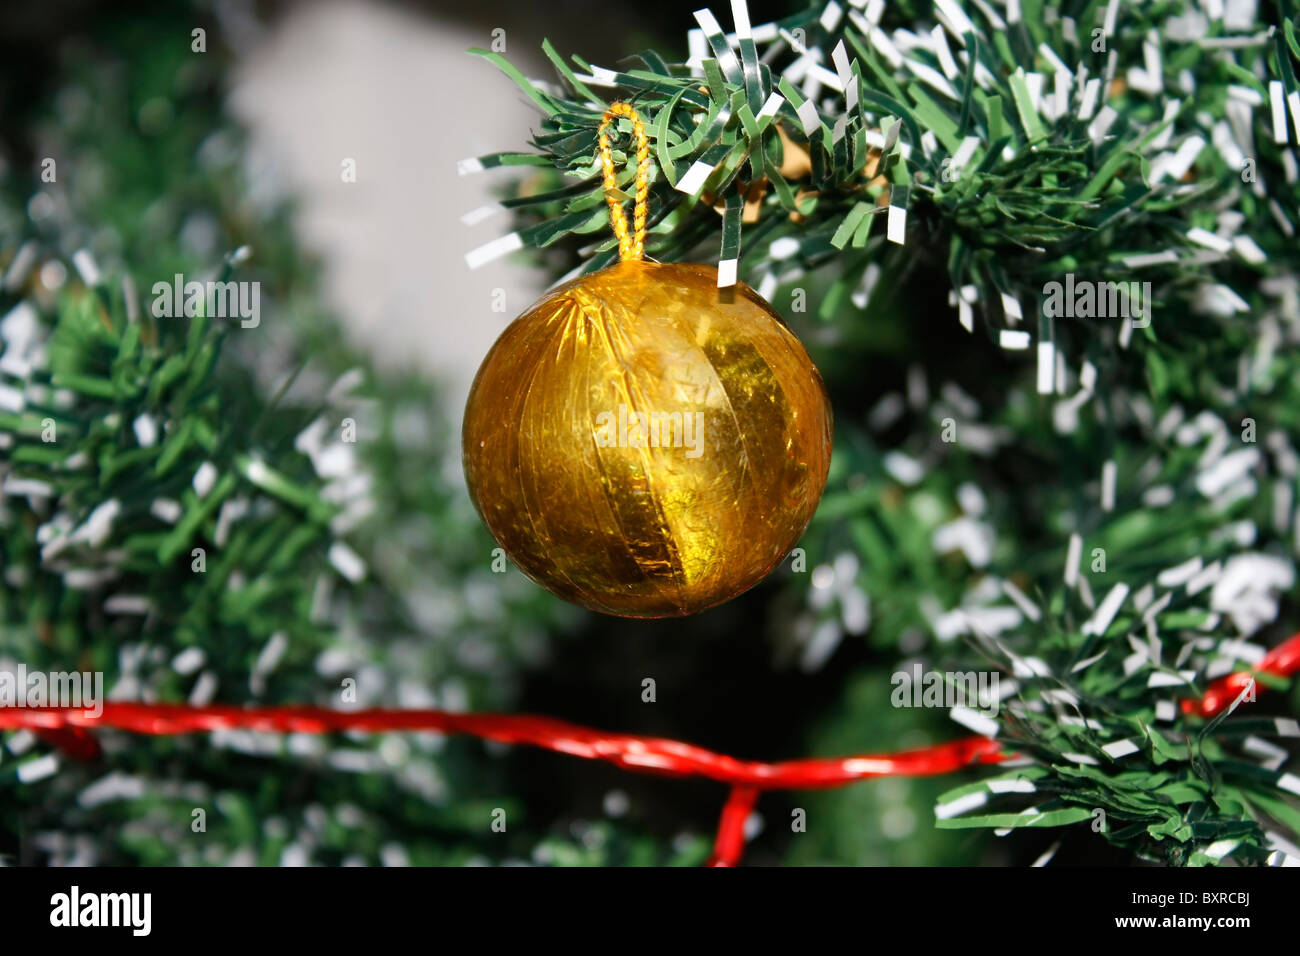 christmas tree decoration item ornament - Stock Image